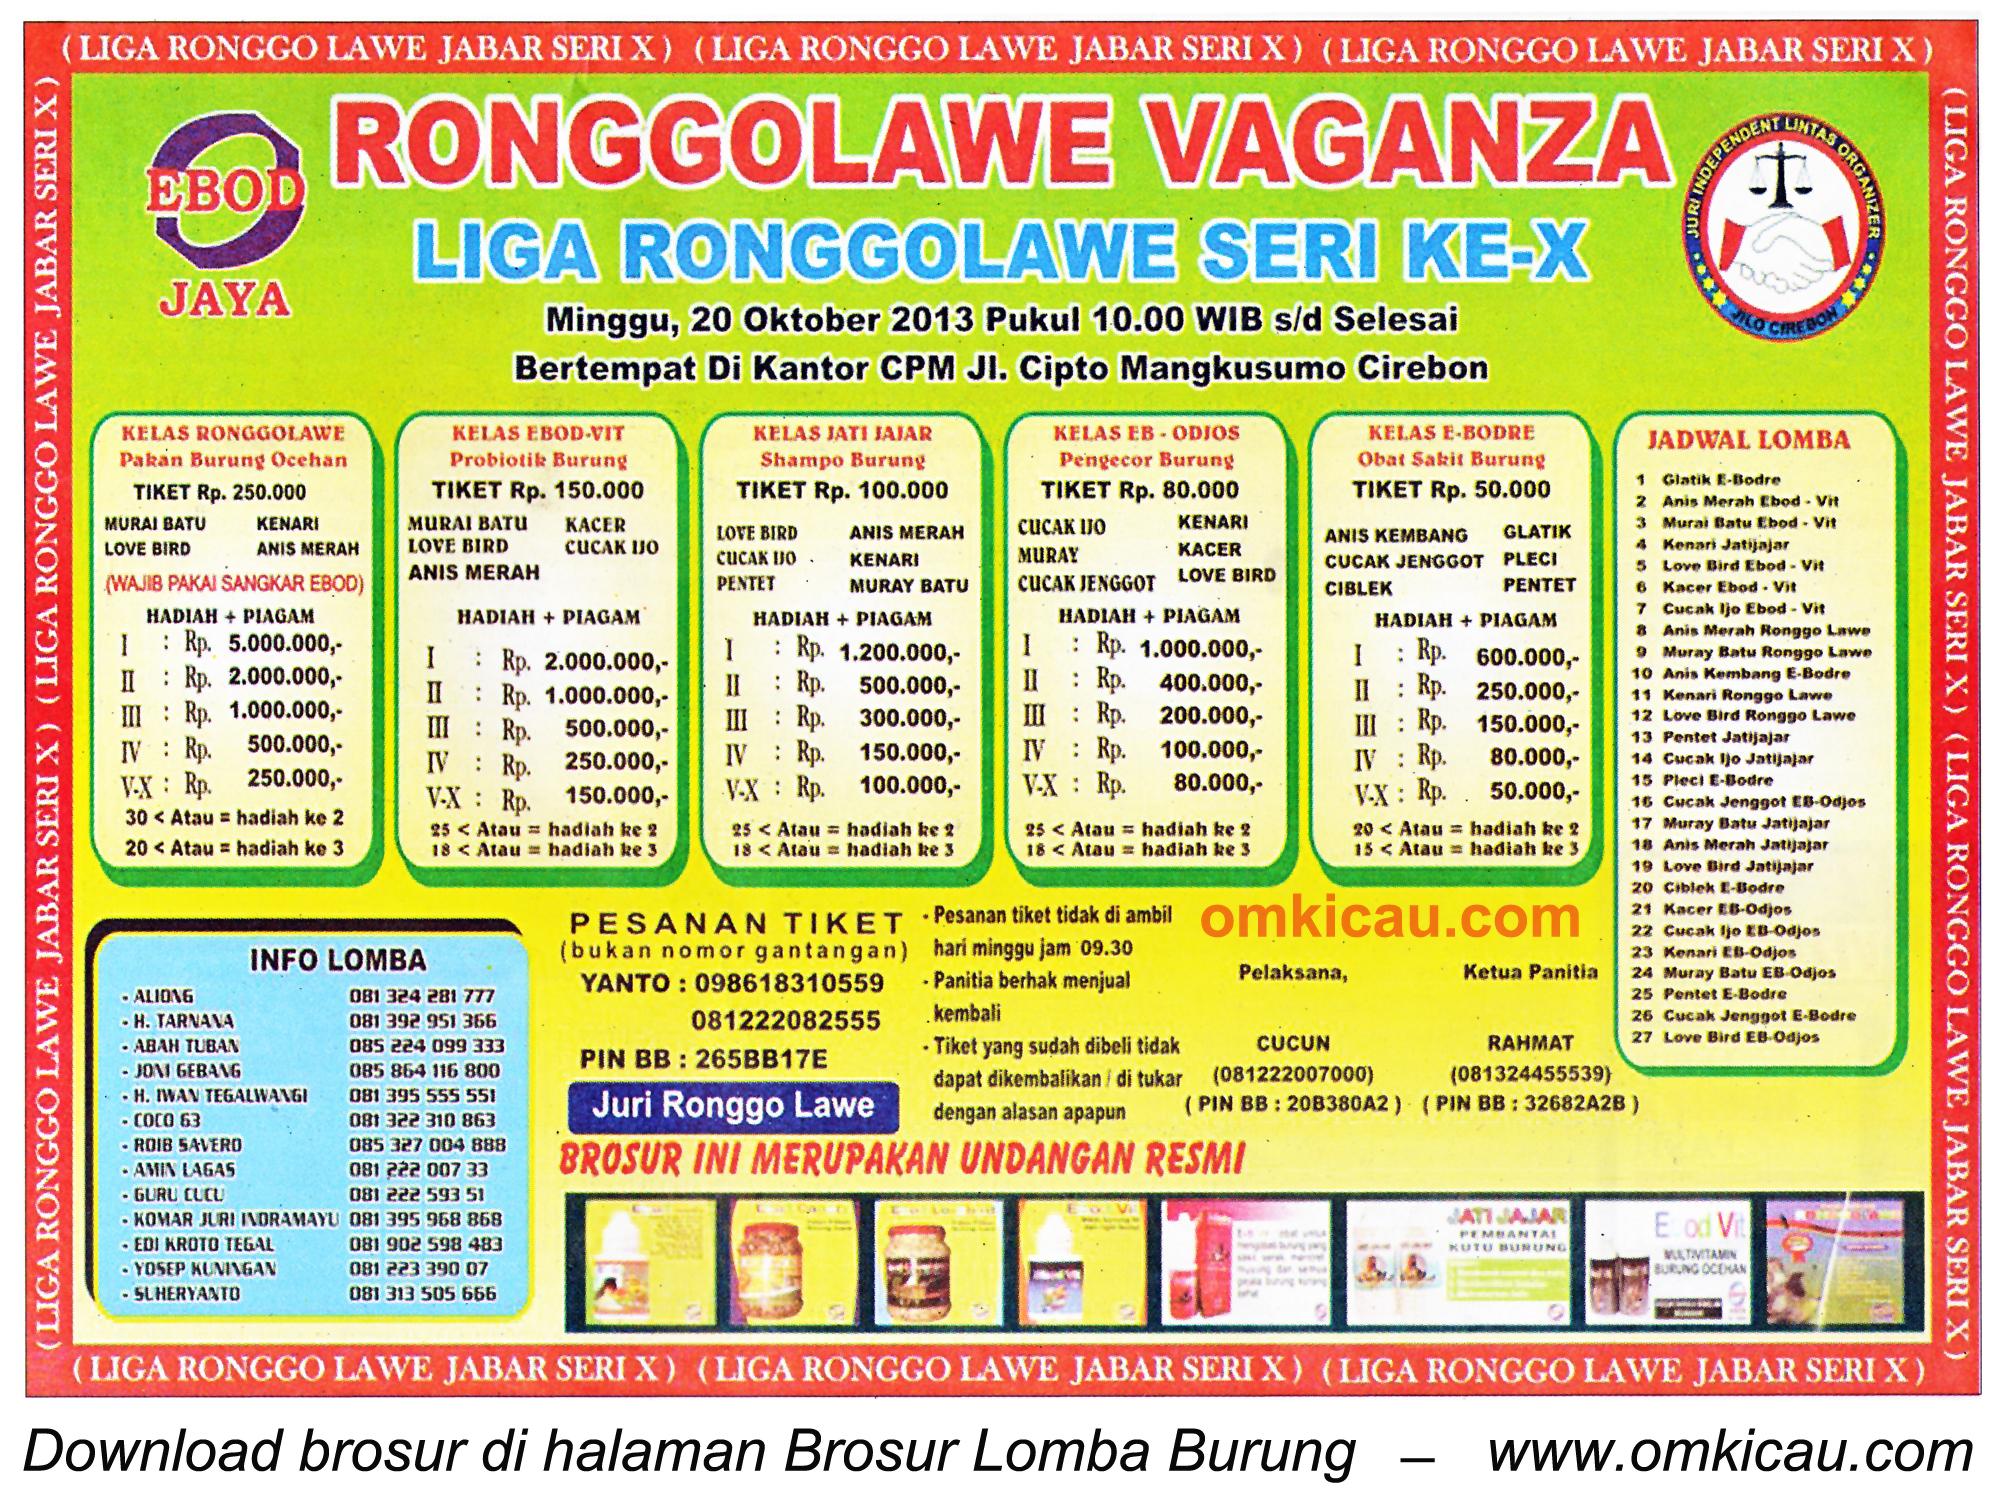 Brosur Lomba Burung Ronggolawe Vaganza (LRJ 10), Cirebon, 20 Oktober 2013